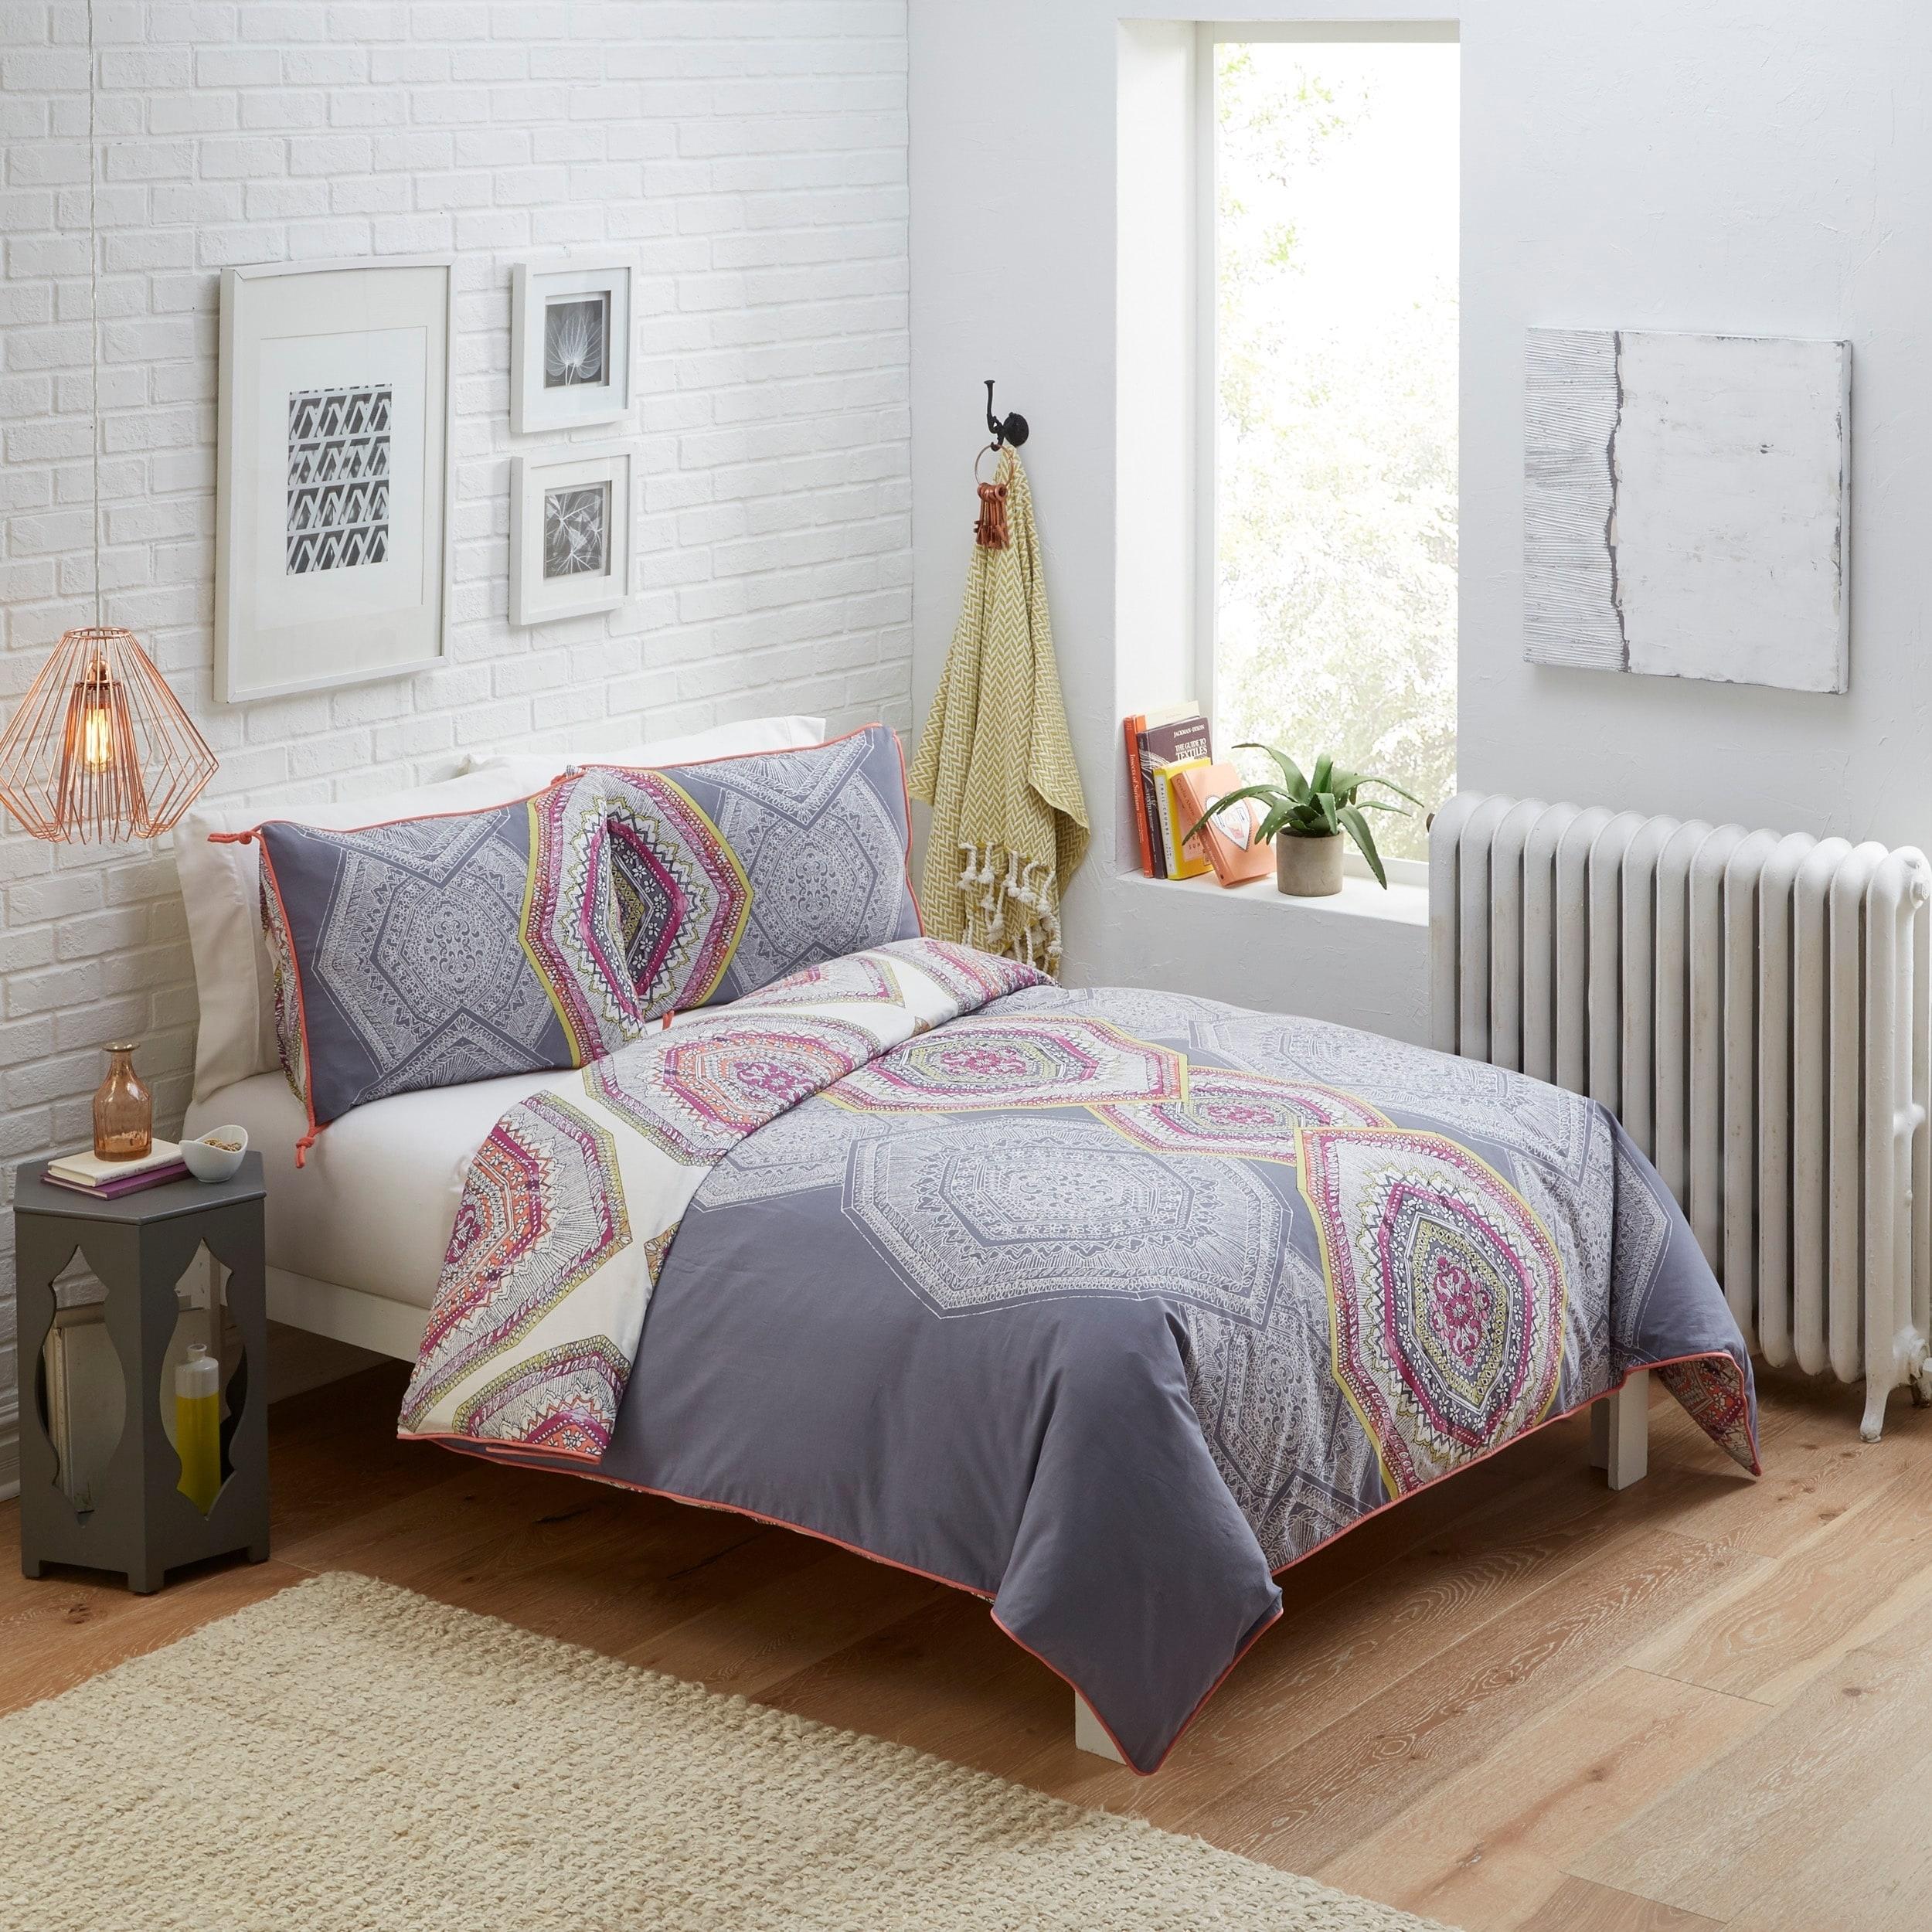 Boho Boutique New Moon 3 Piece Reversible Comforter Set (...